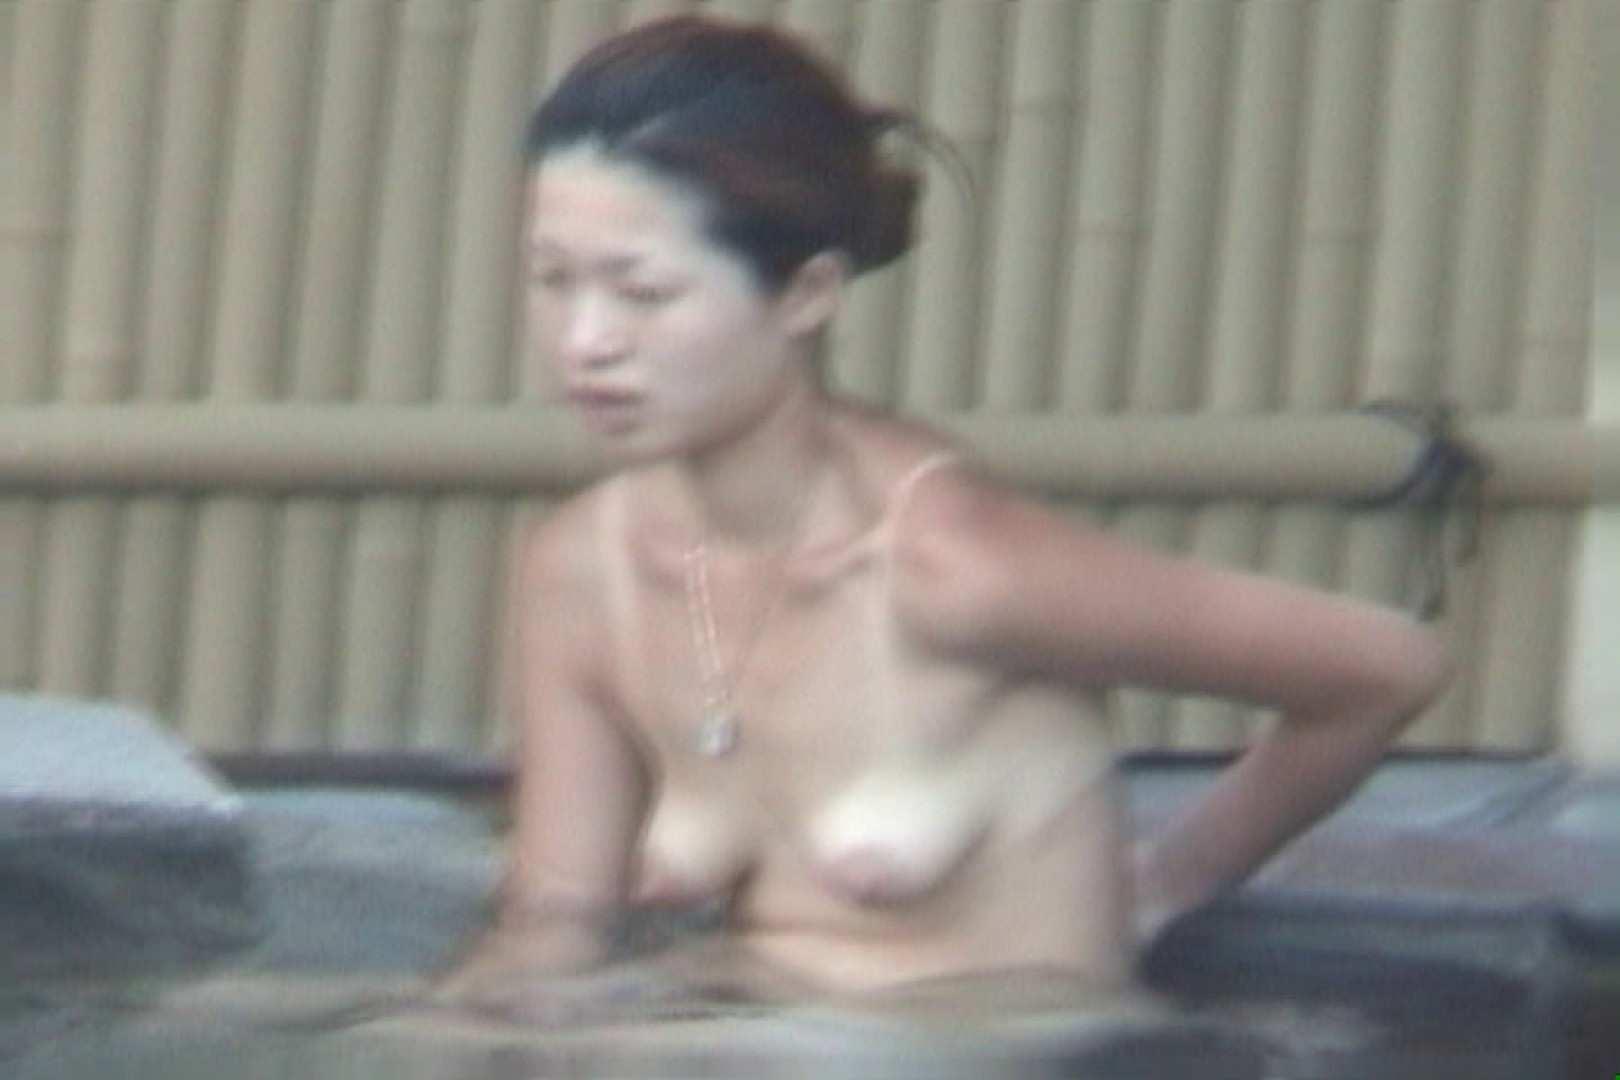 Aquaな露天風呂Vol.571 盗撮 | OLセックス  83画像 82